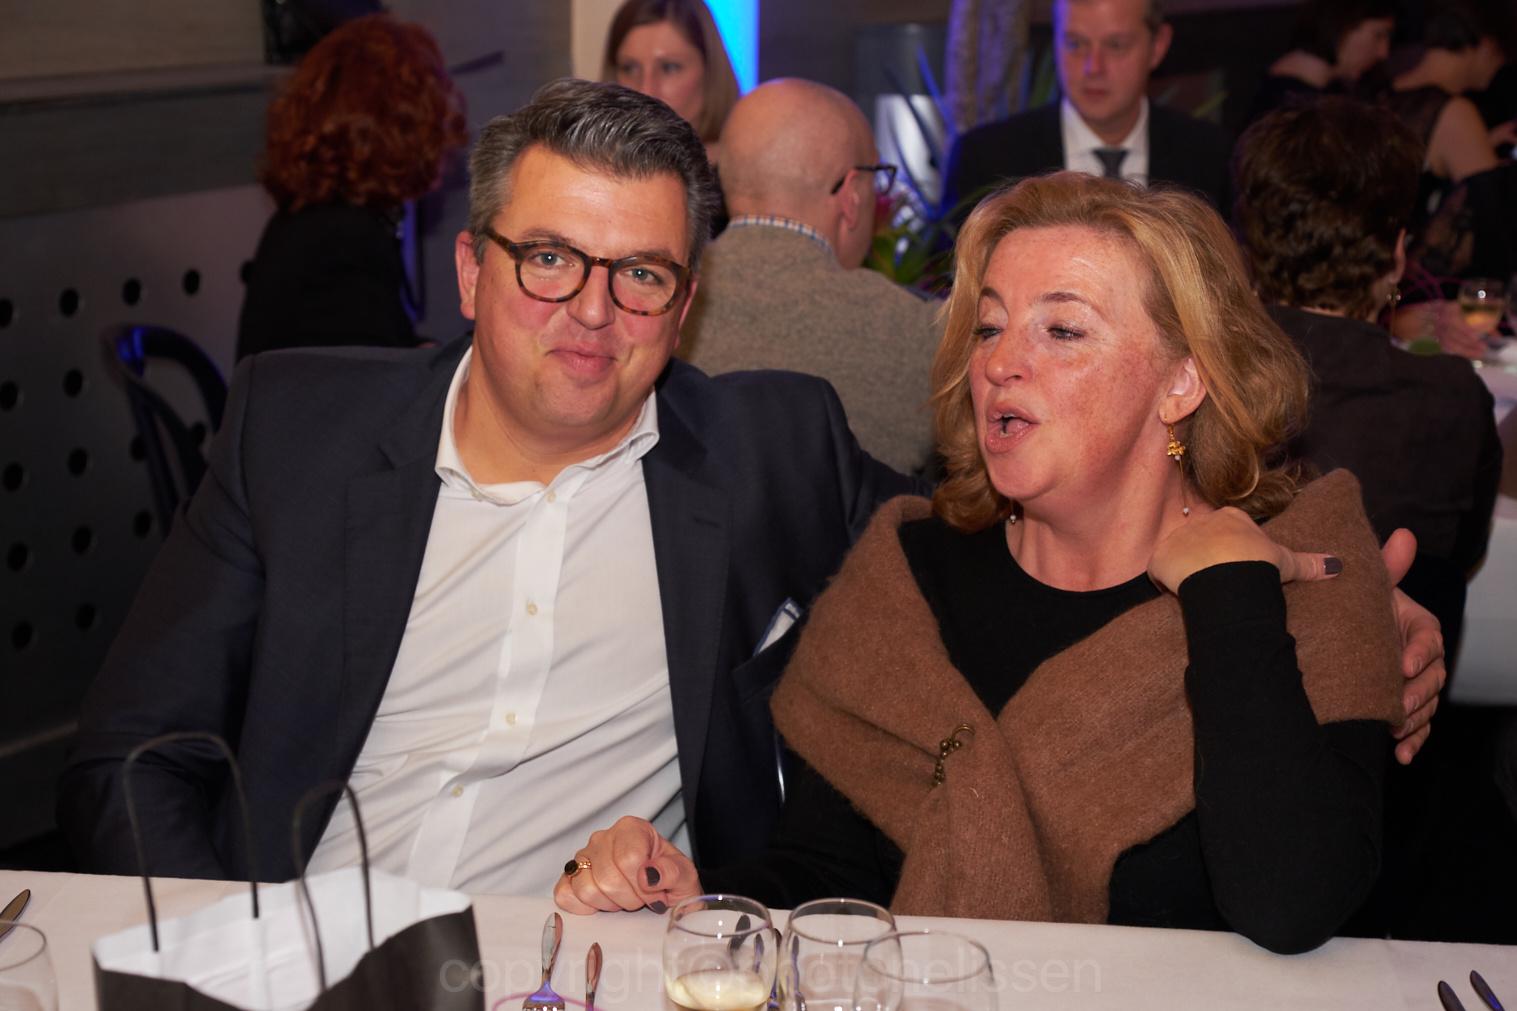 Photos Banquet des Dames – Samedi 24 novembre 2018 🗓